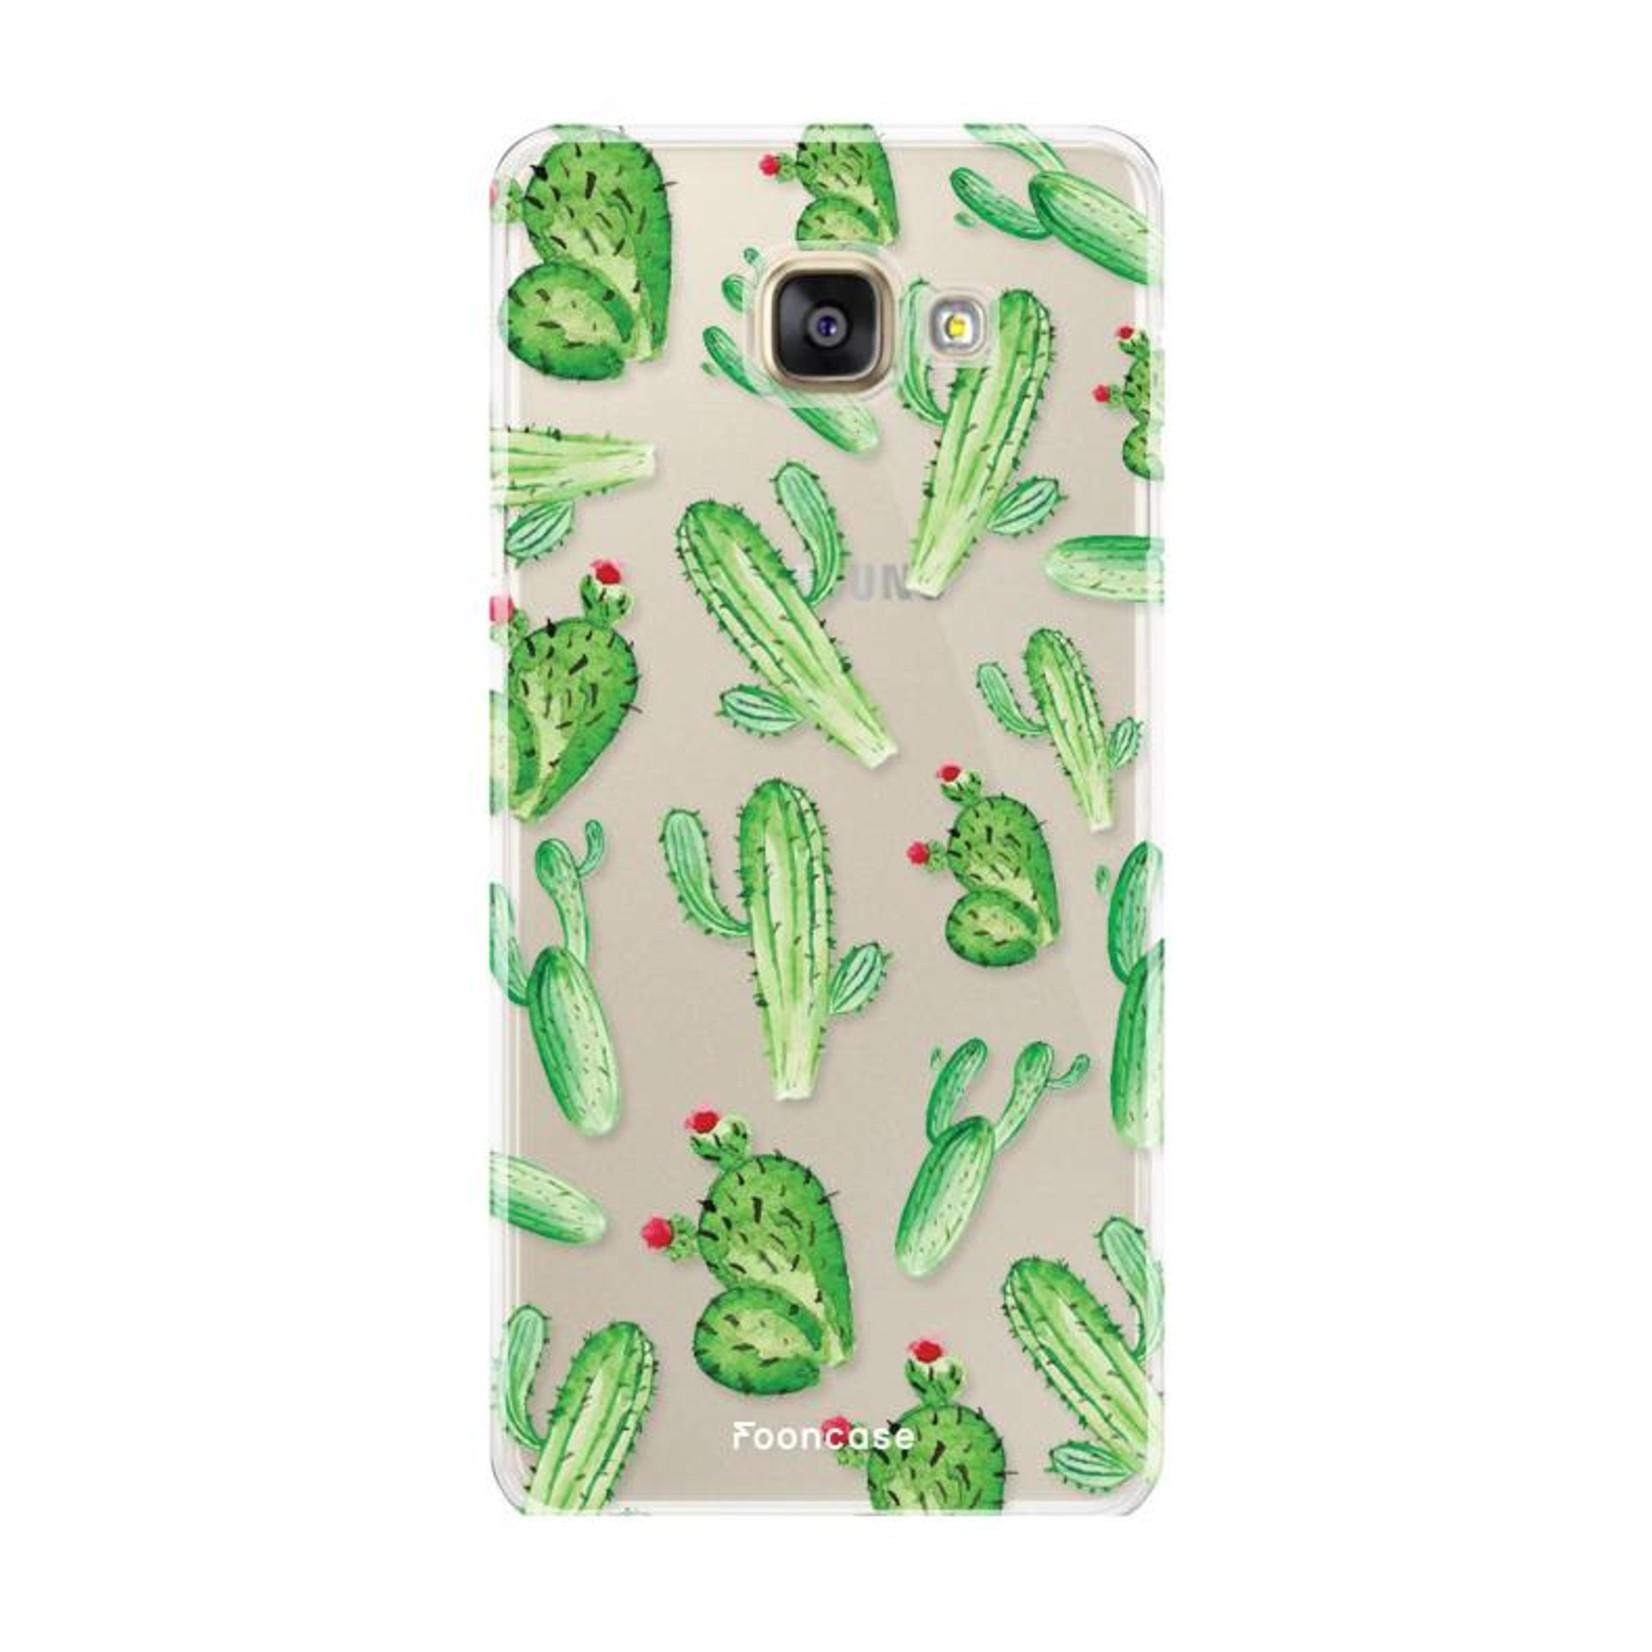 FOONCASE Samsung Galaxy A3 2016 Handyhülle - Kaktus